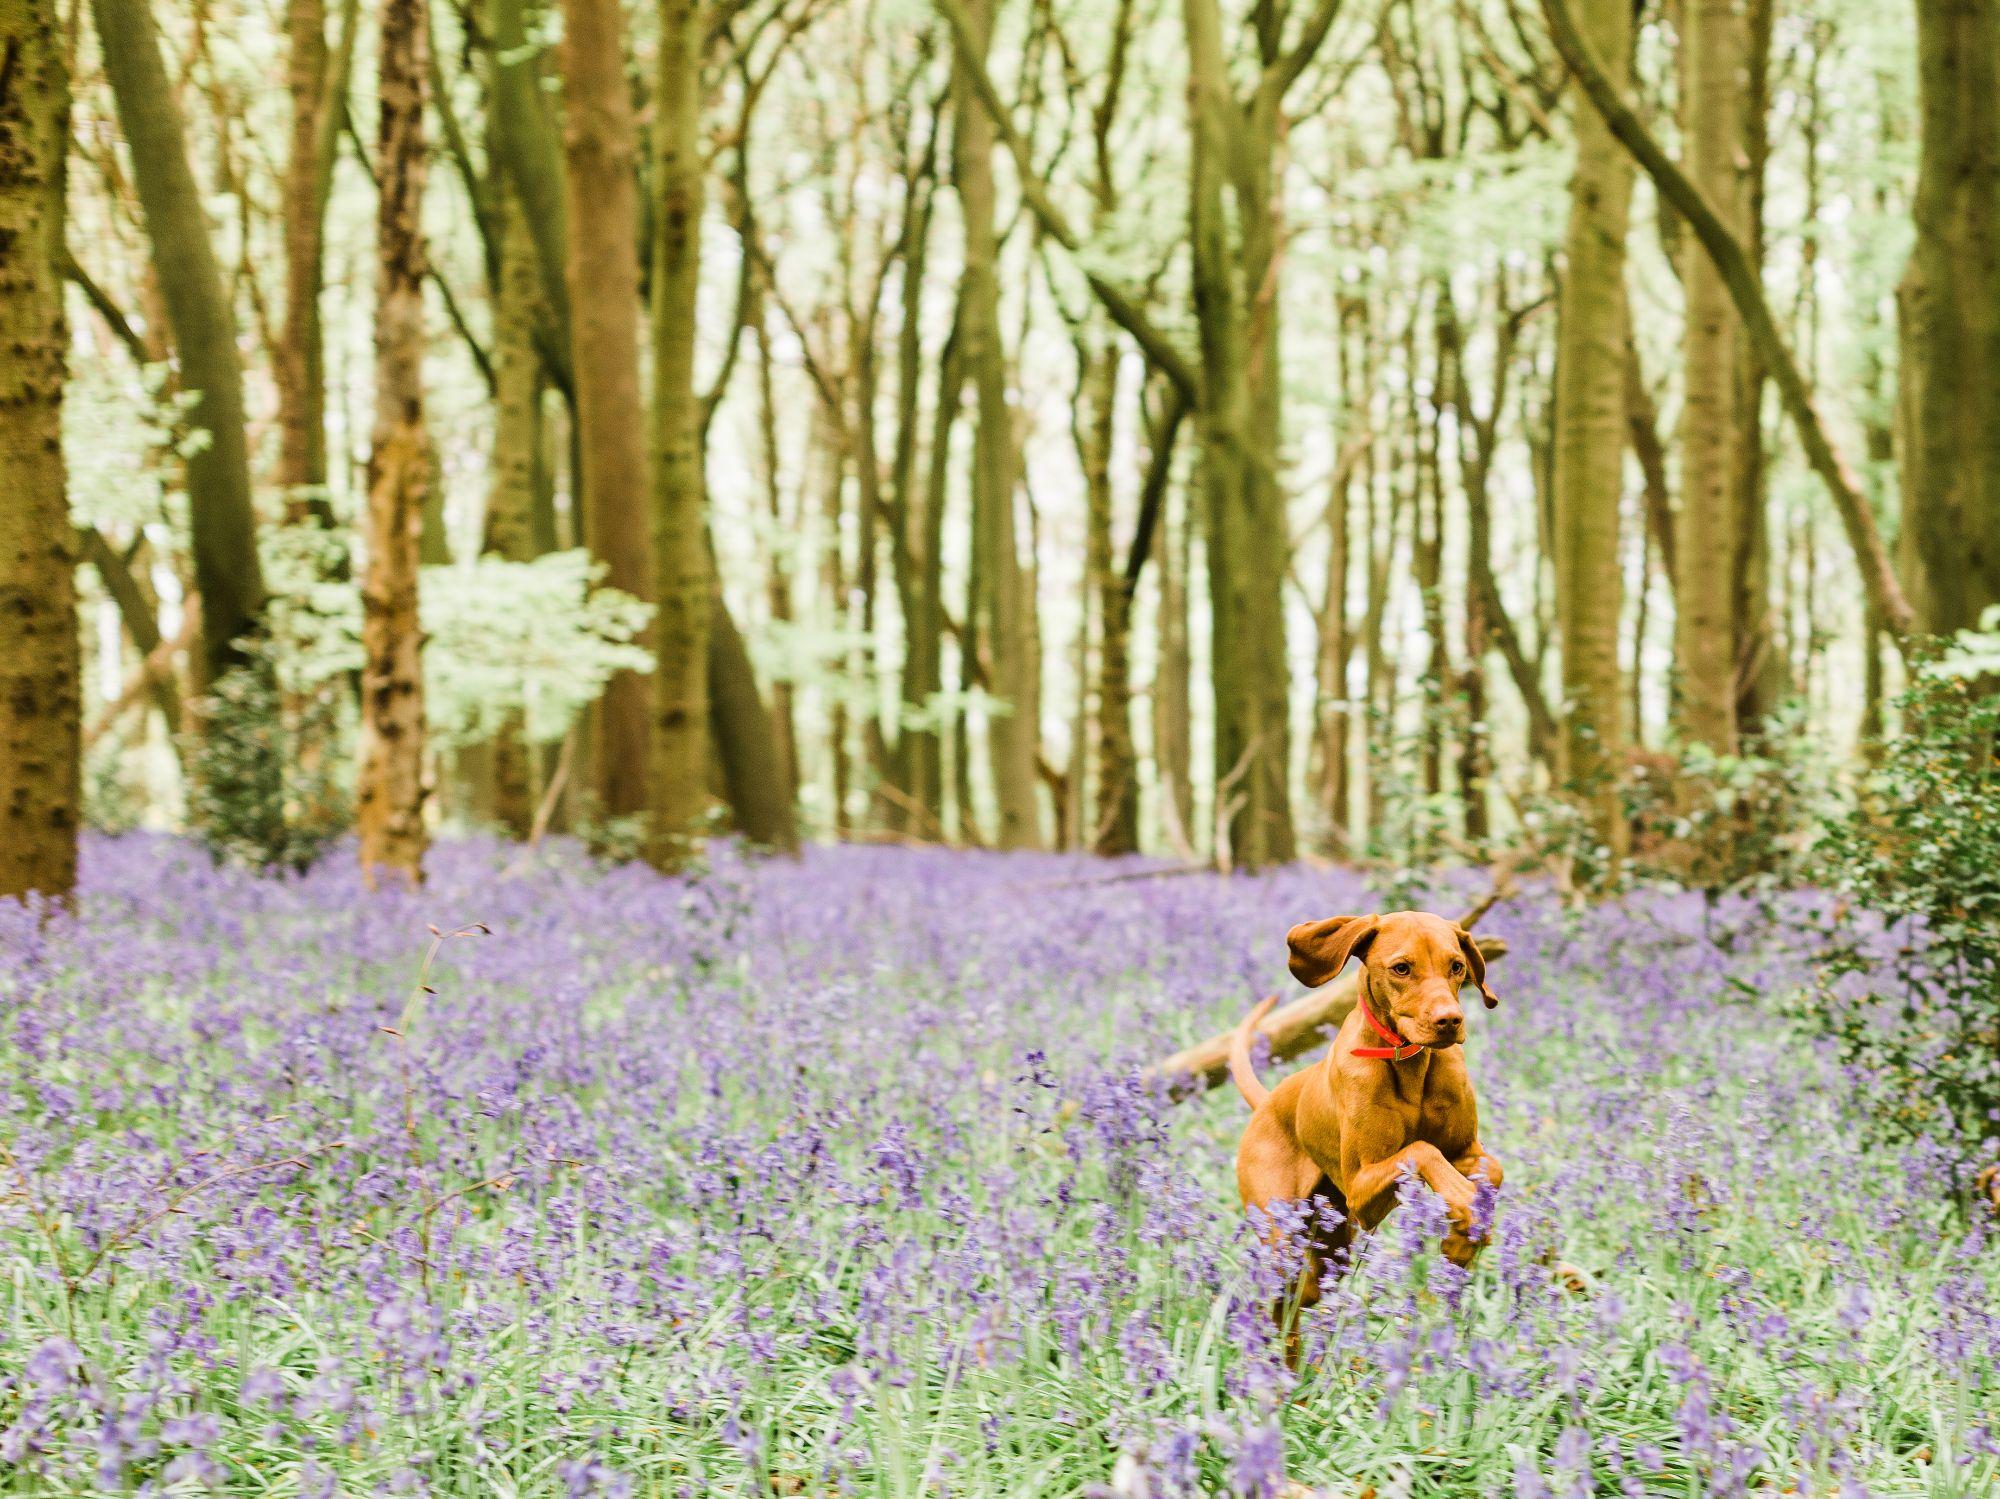 maple the dog - Lichfield professional photographer